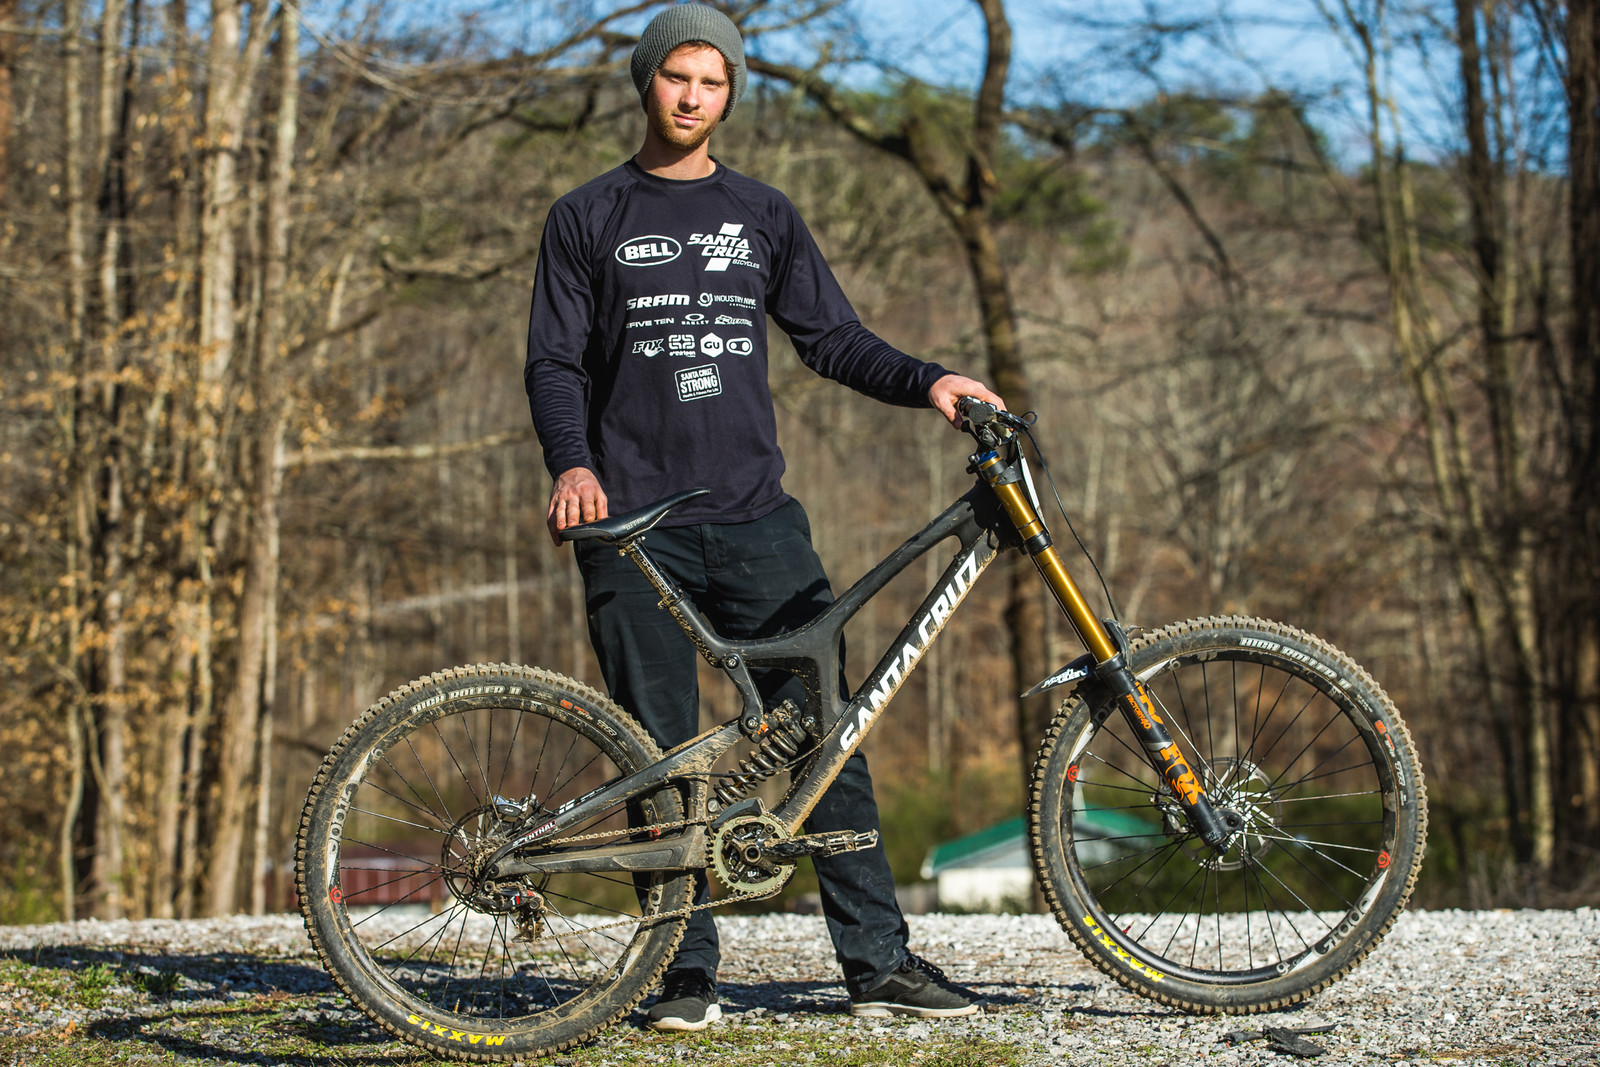 Pro GRT Pro Bike - Kiran MacKinnon's XXL Santa Cruz V10c - Pro Bikes from Windrock Pro GRT - Mountain Biking Pictures - Vital MTB